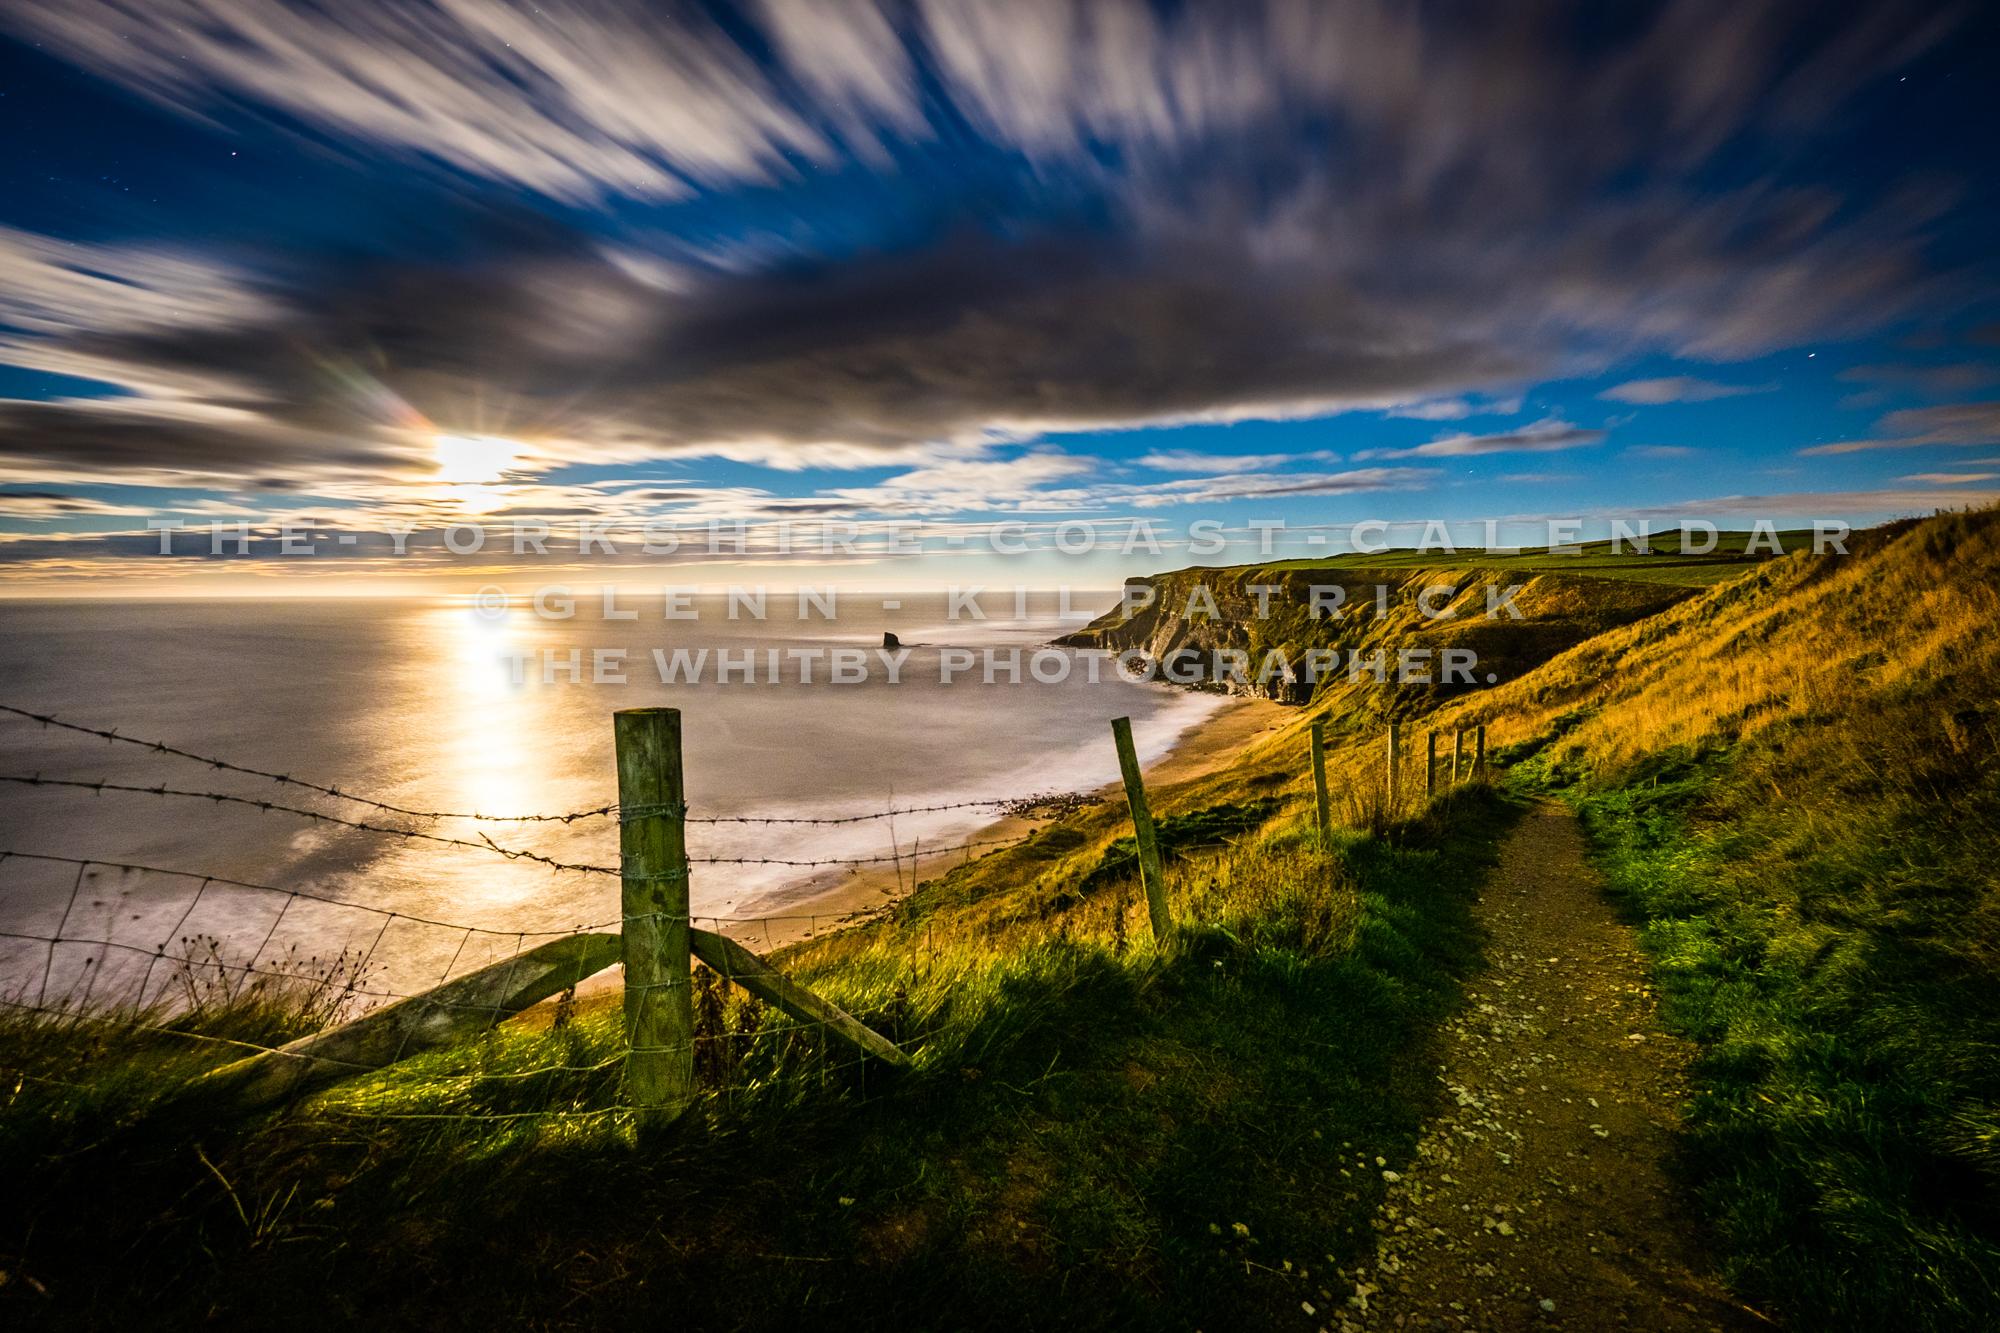 Full Moon Rising At Saltwick Bay - The Yorkshire Coast Calendar 2018 By Glenn Kilpatrick.